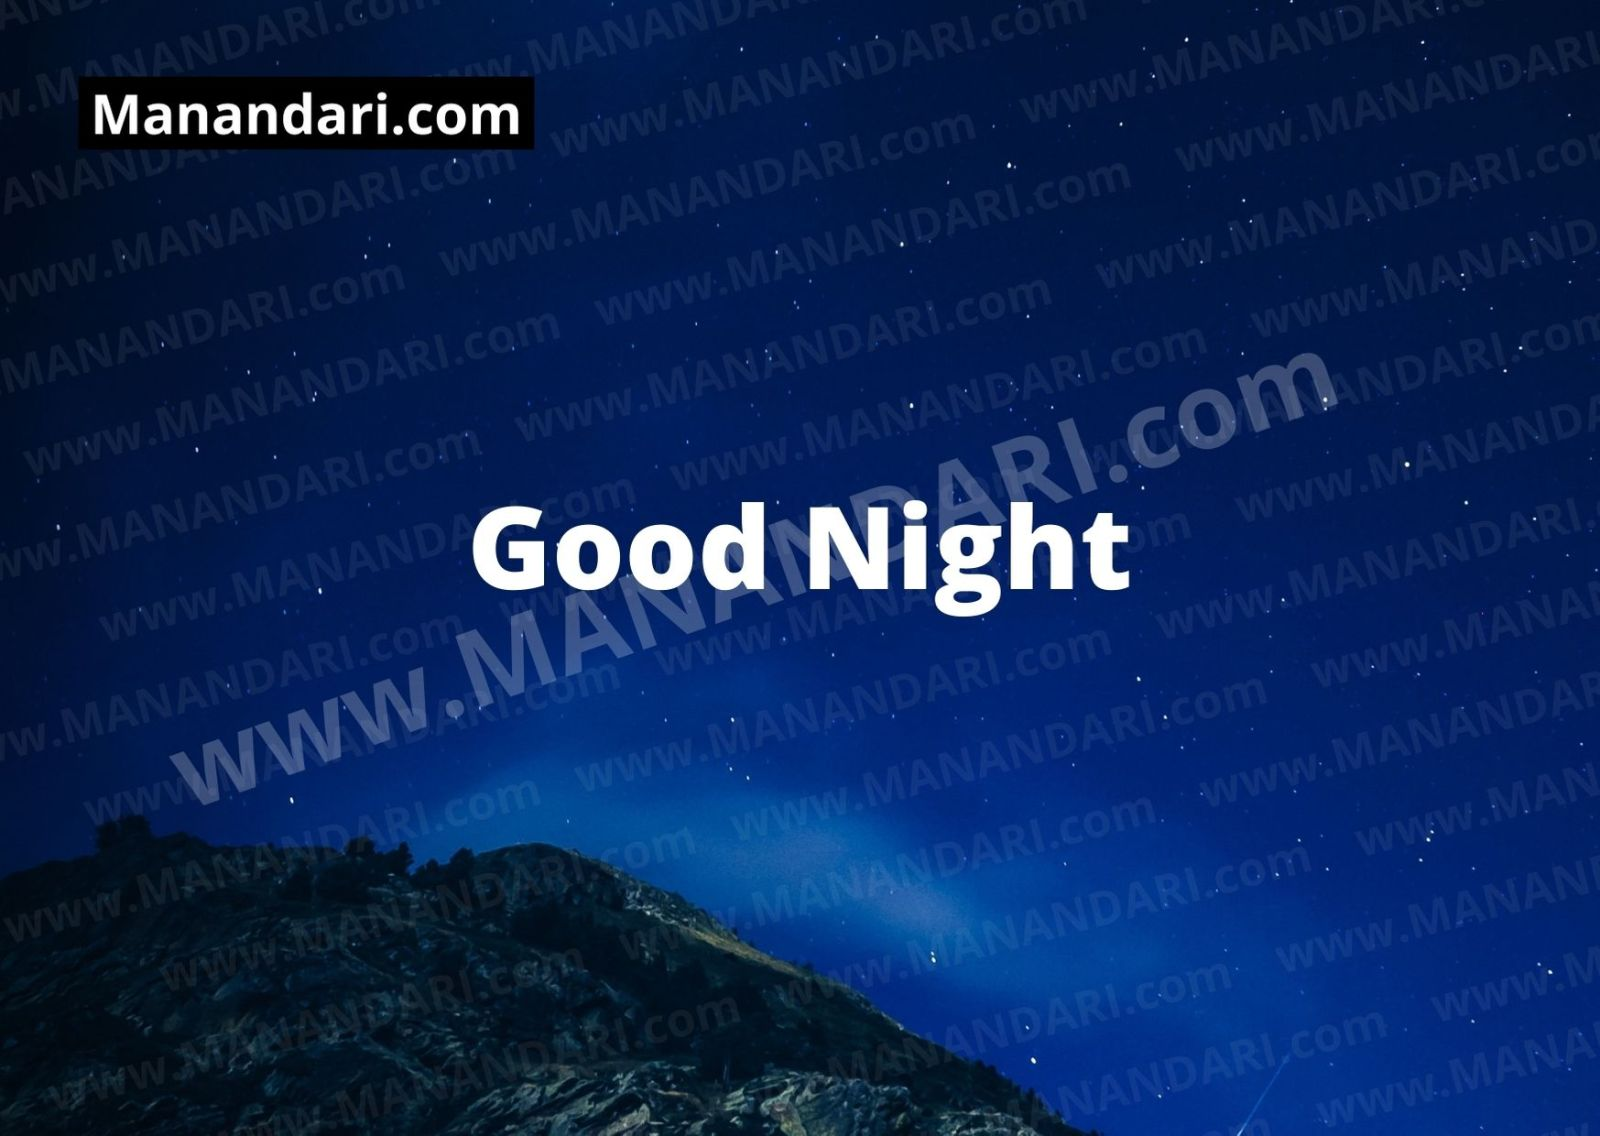 Good Night - 11